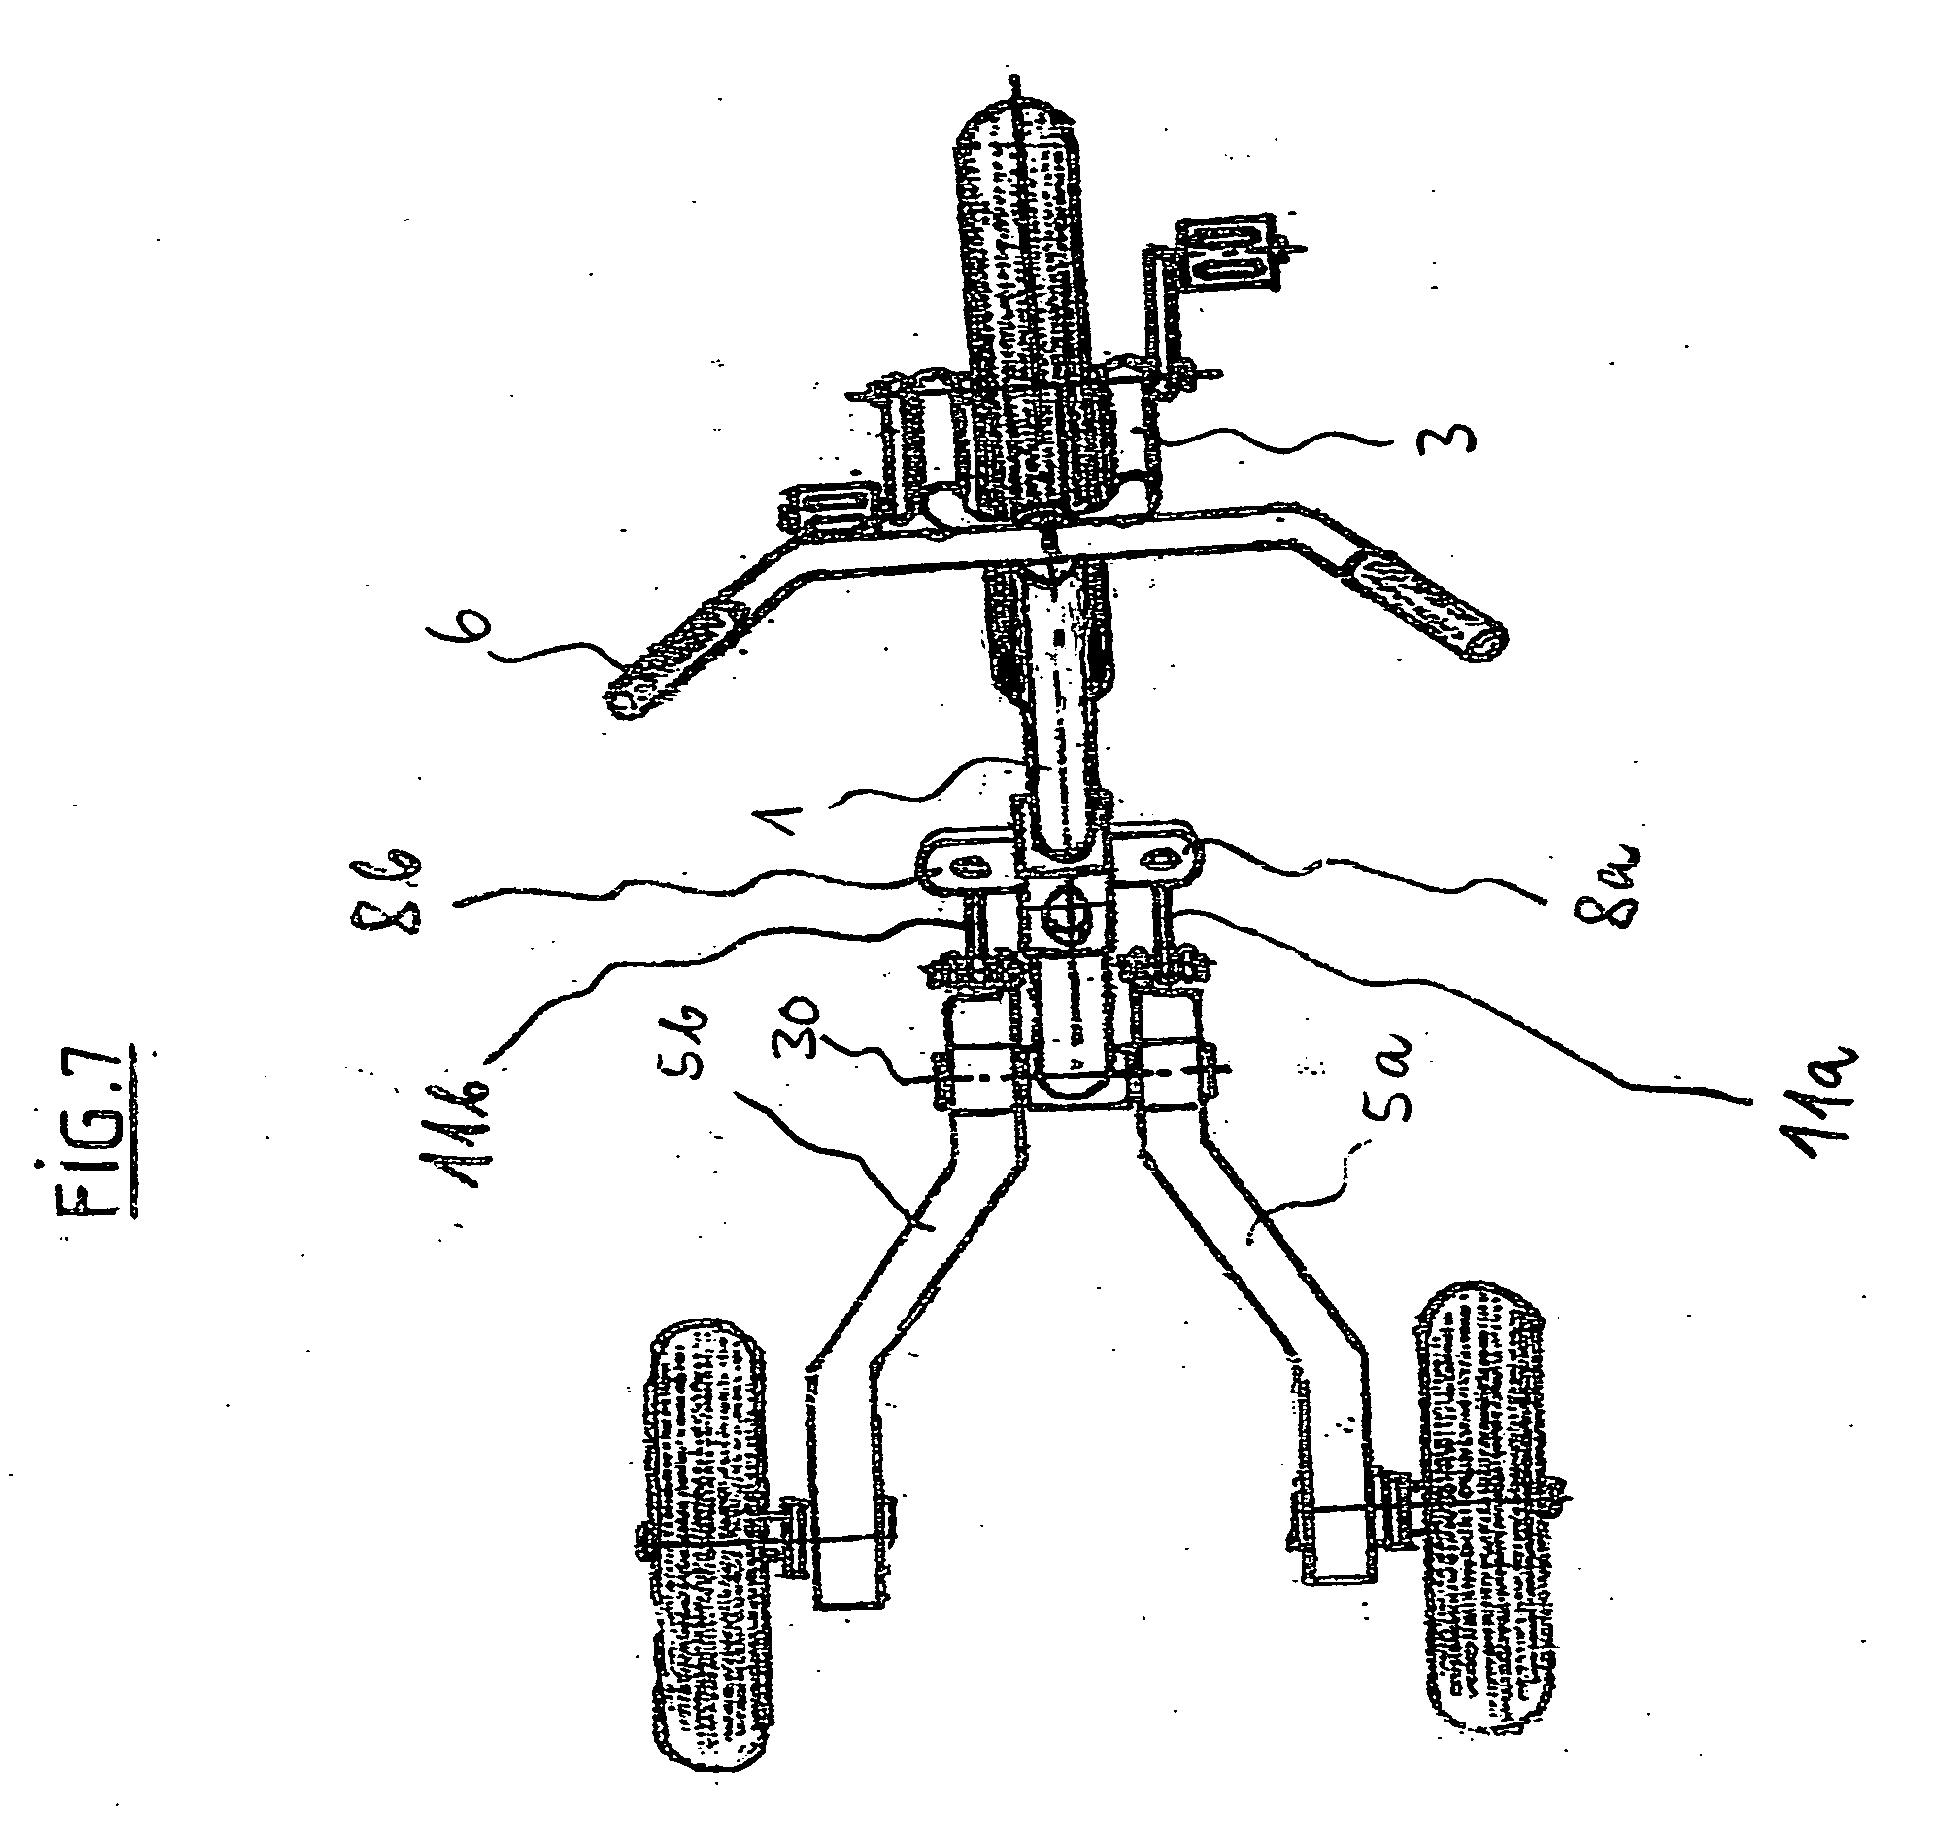 patent ep2086824b1 fahrzeug mit drei r dern google patents. Black Bedroom Furniture Sets. Home Design Ideas